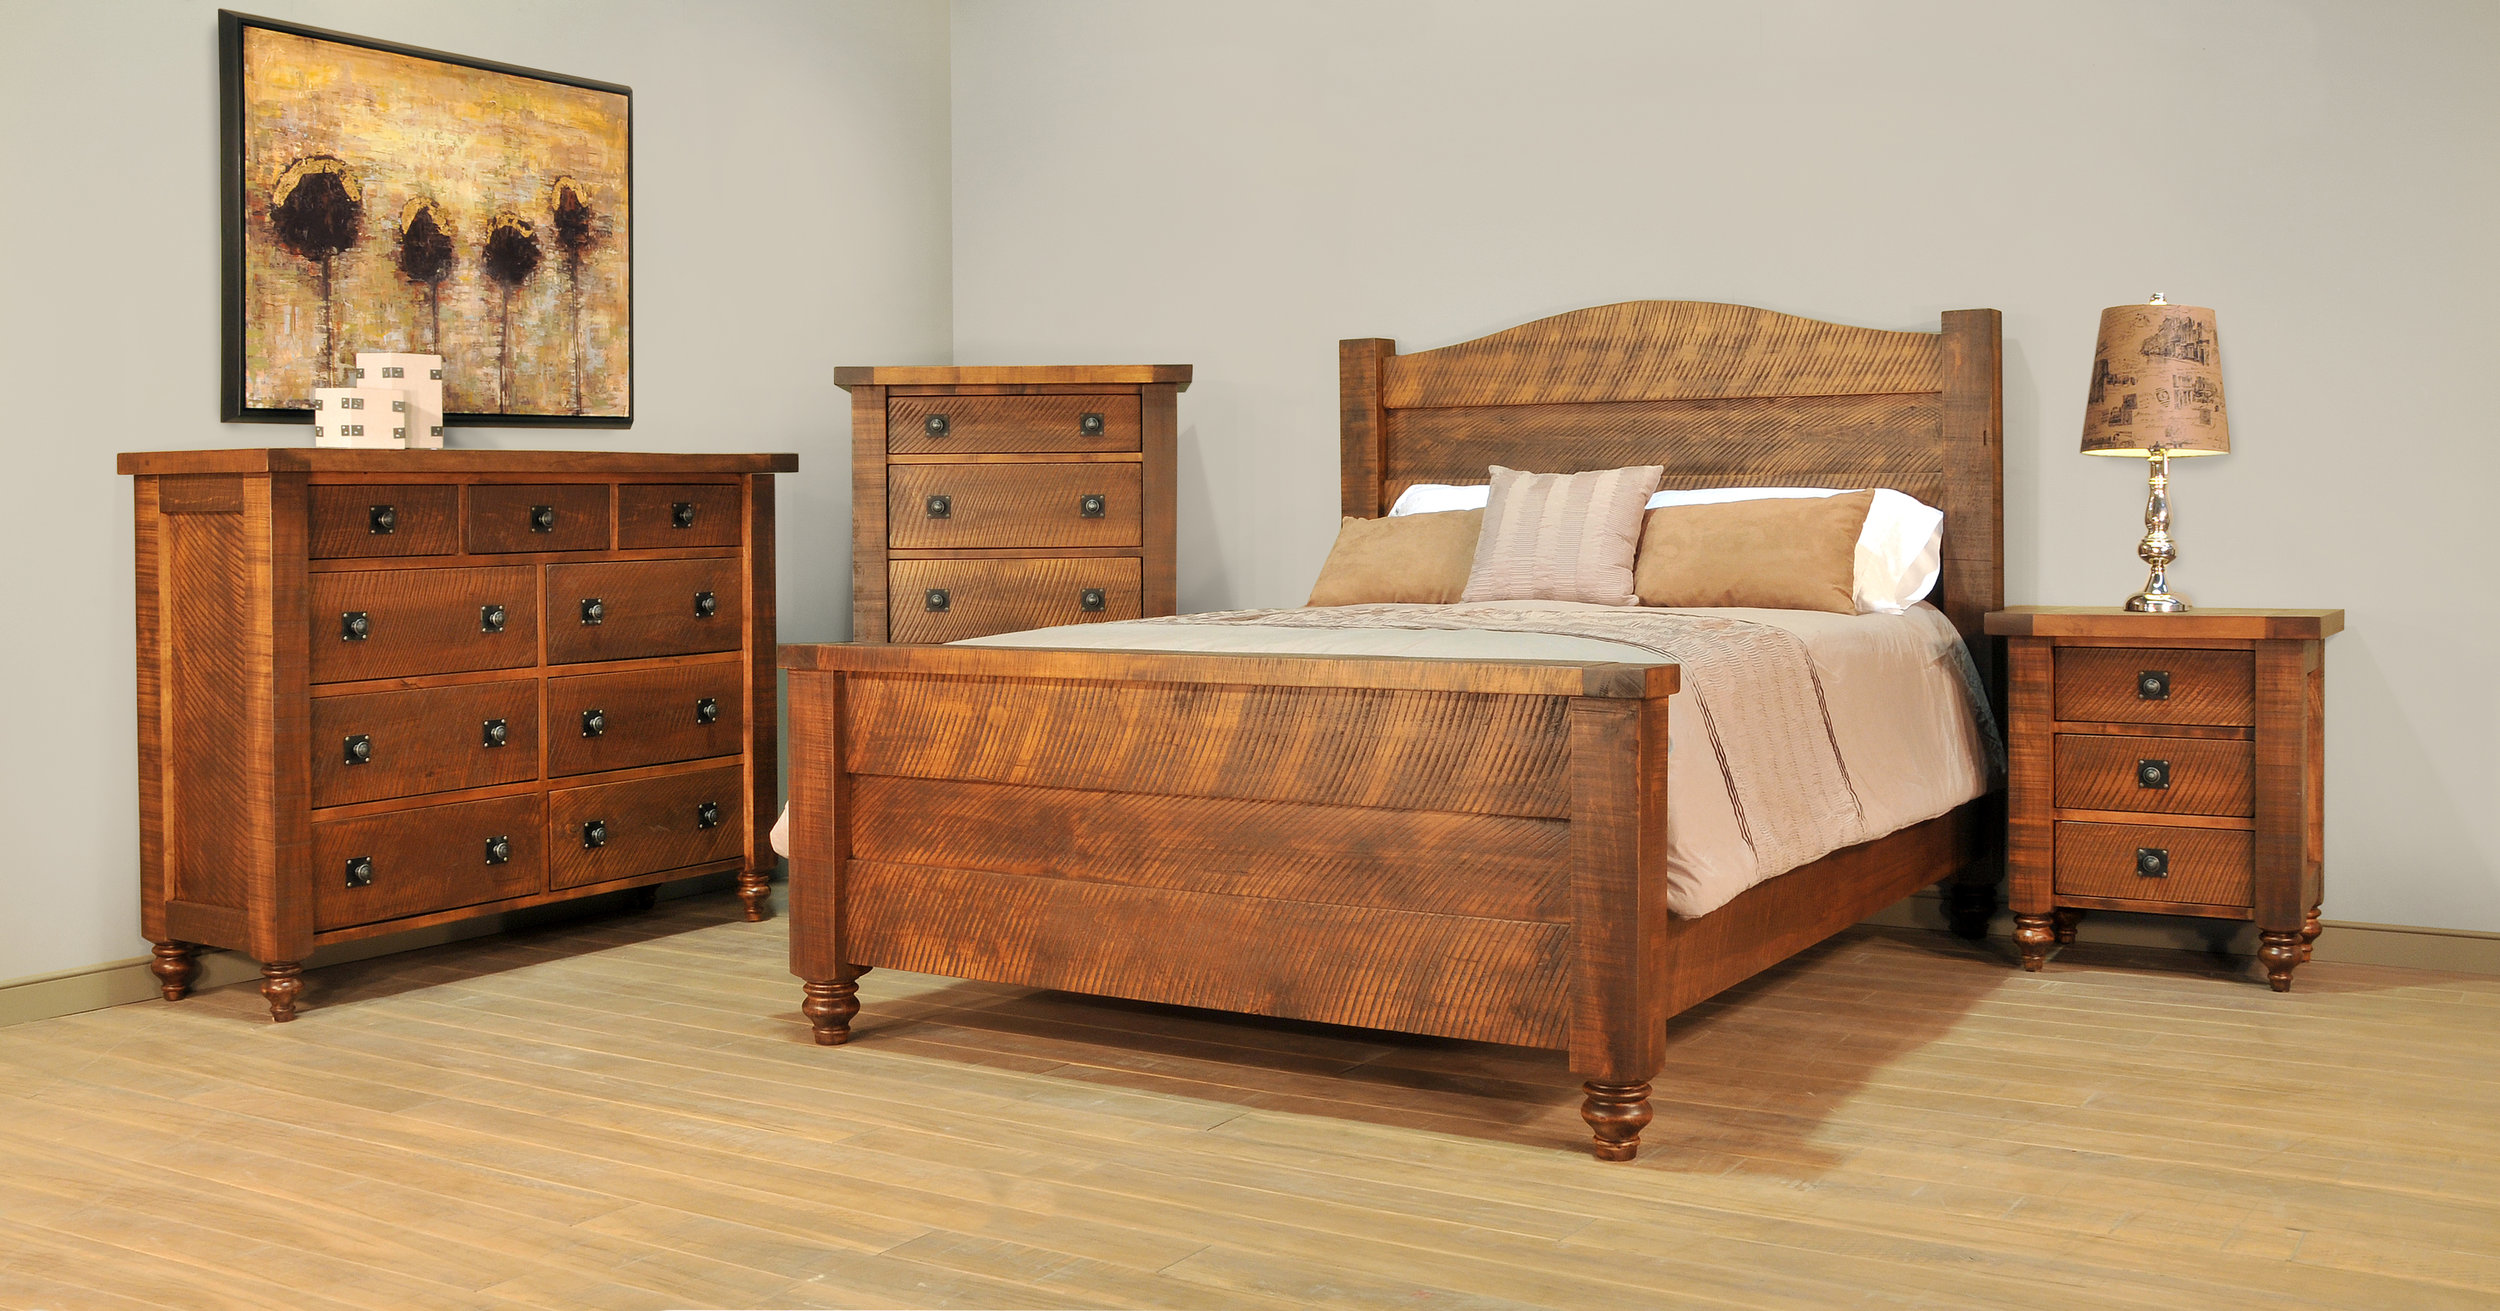 Tahoe bedroom set for sale in PA